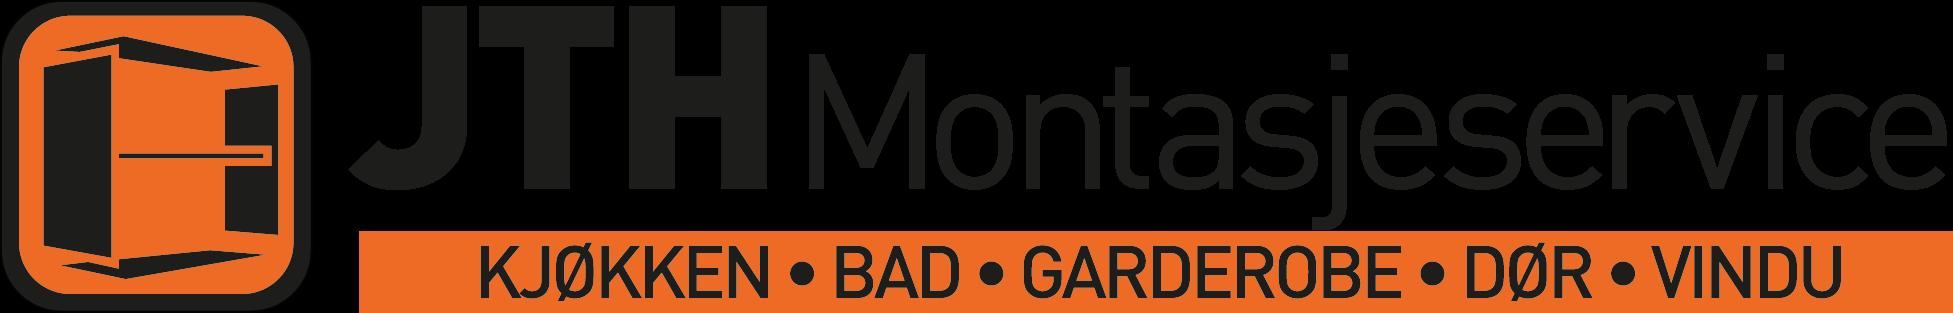 JTH Montasjeservice